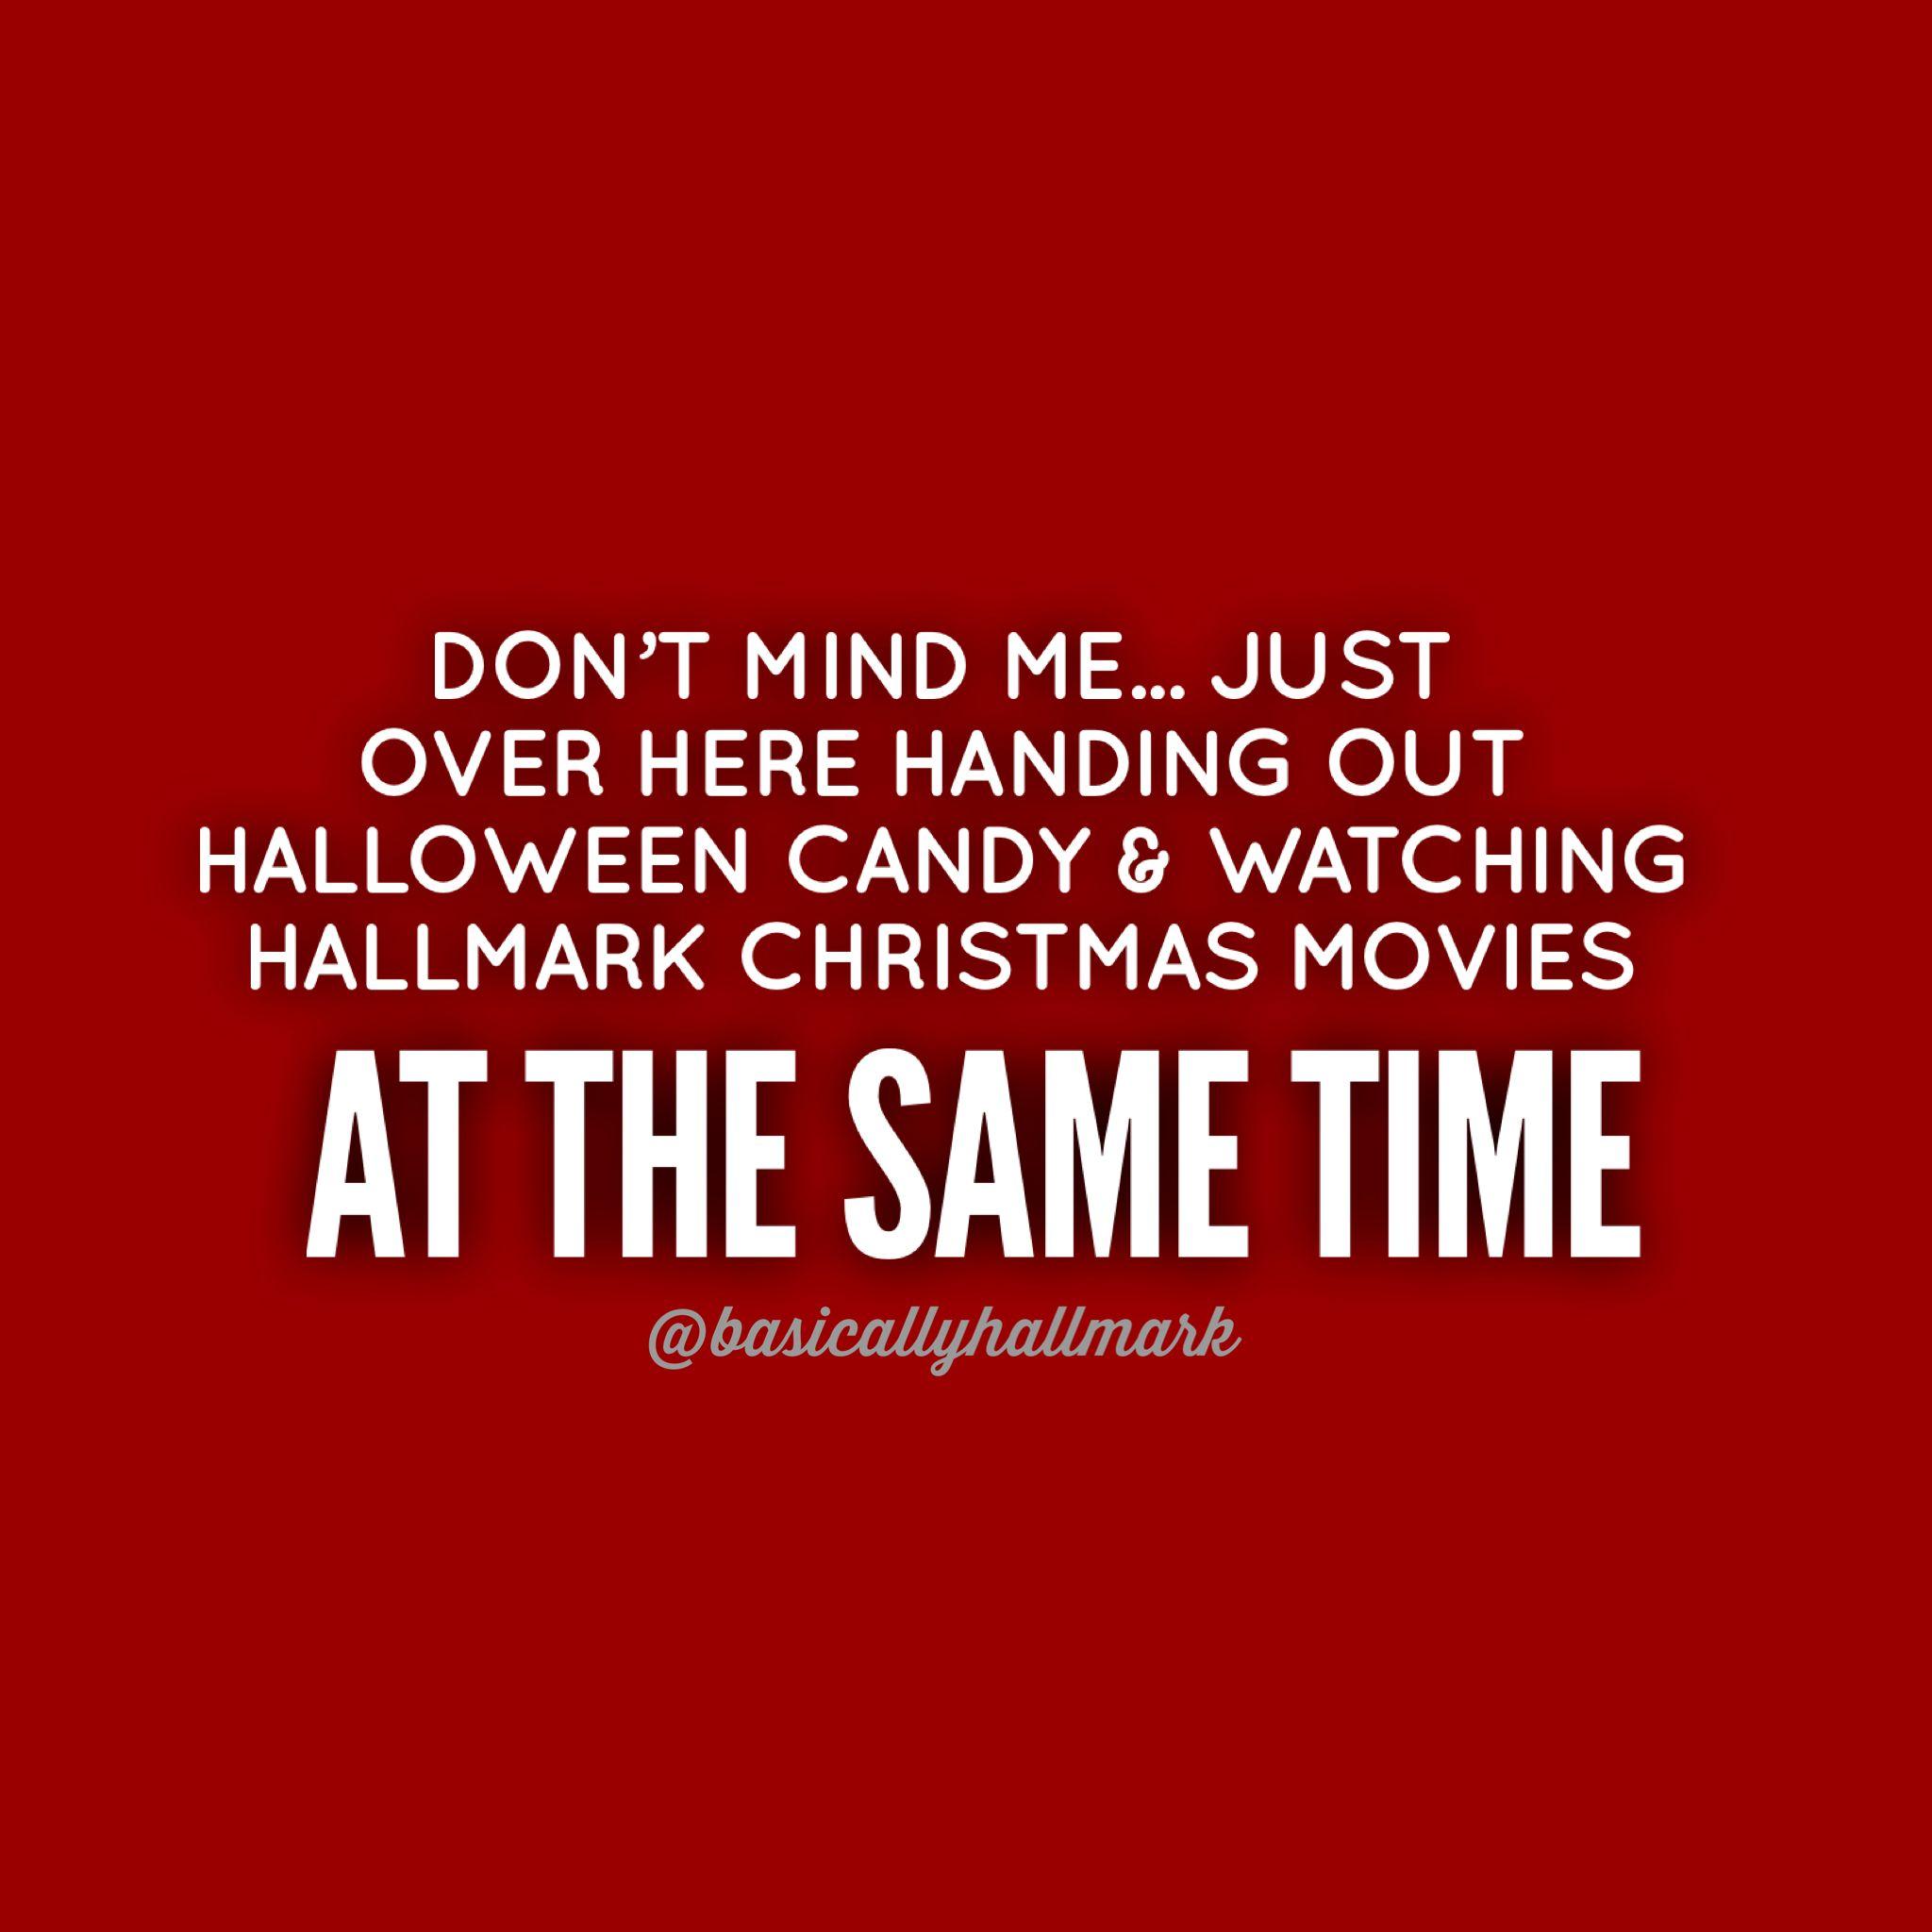 Halloween Hallmark Meme Halloween Quotes Funny Christmas Quotes Funny Christmas Movie Quotes